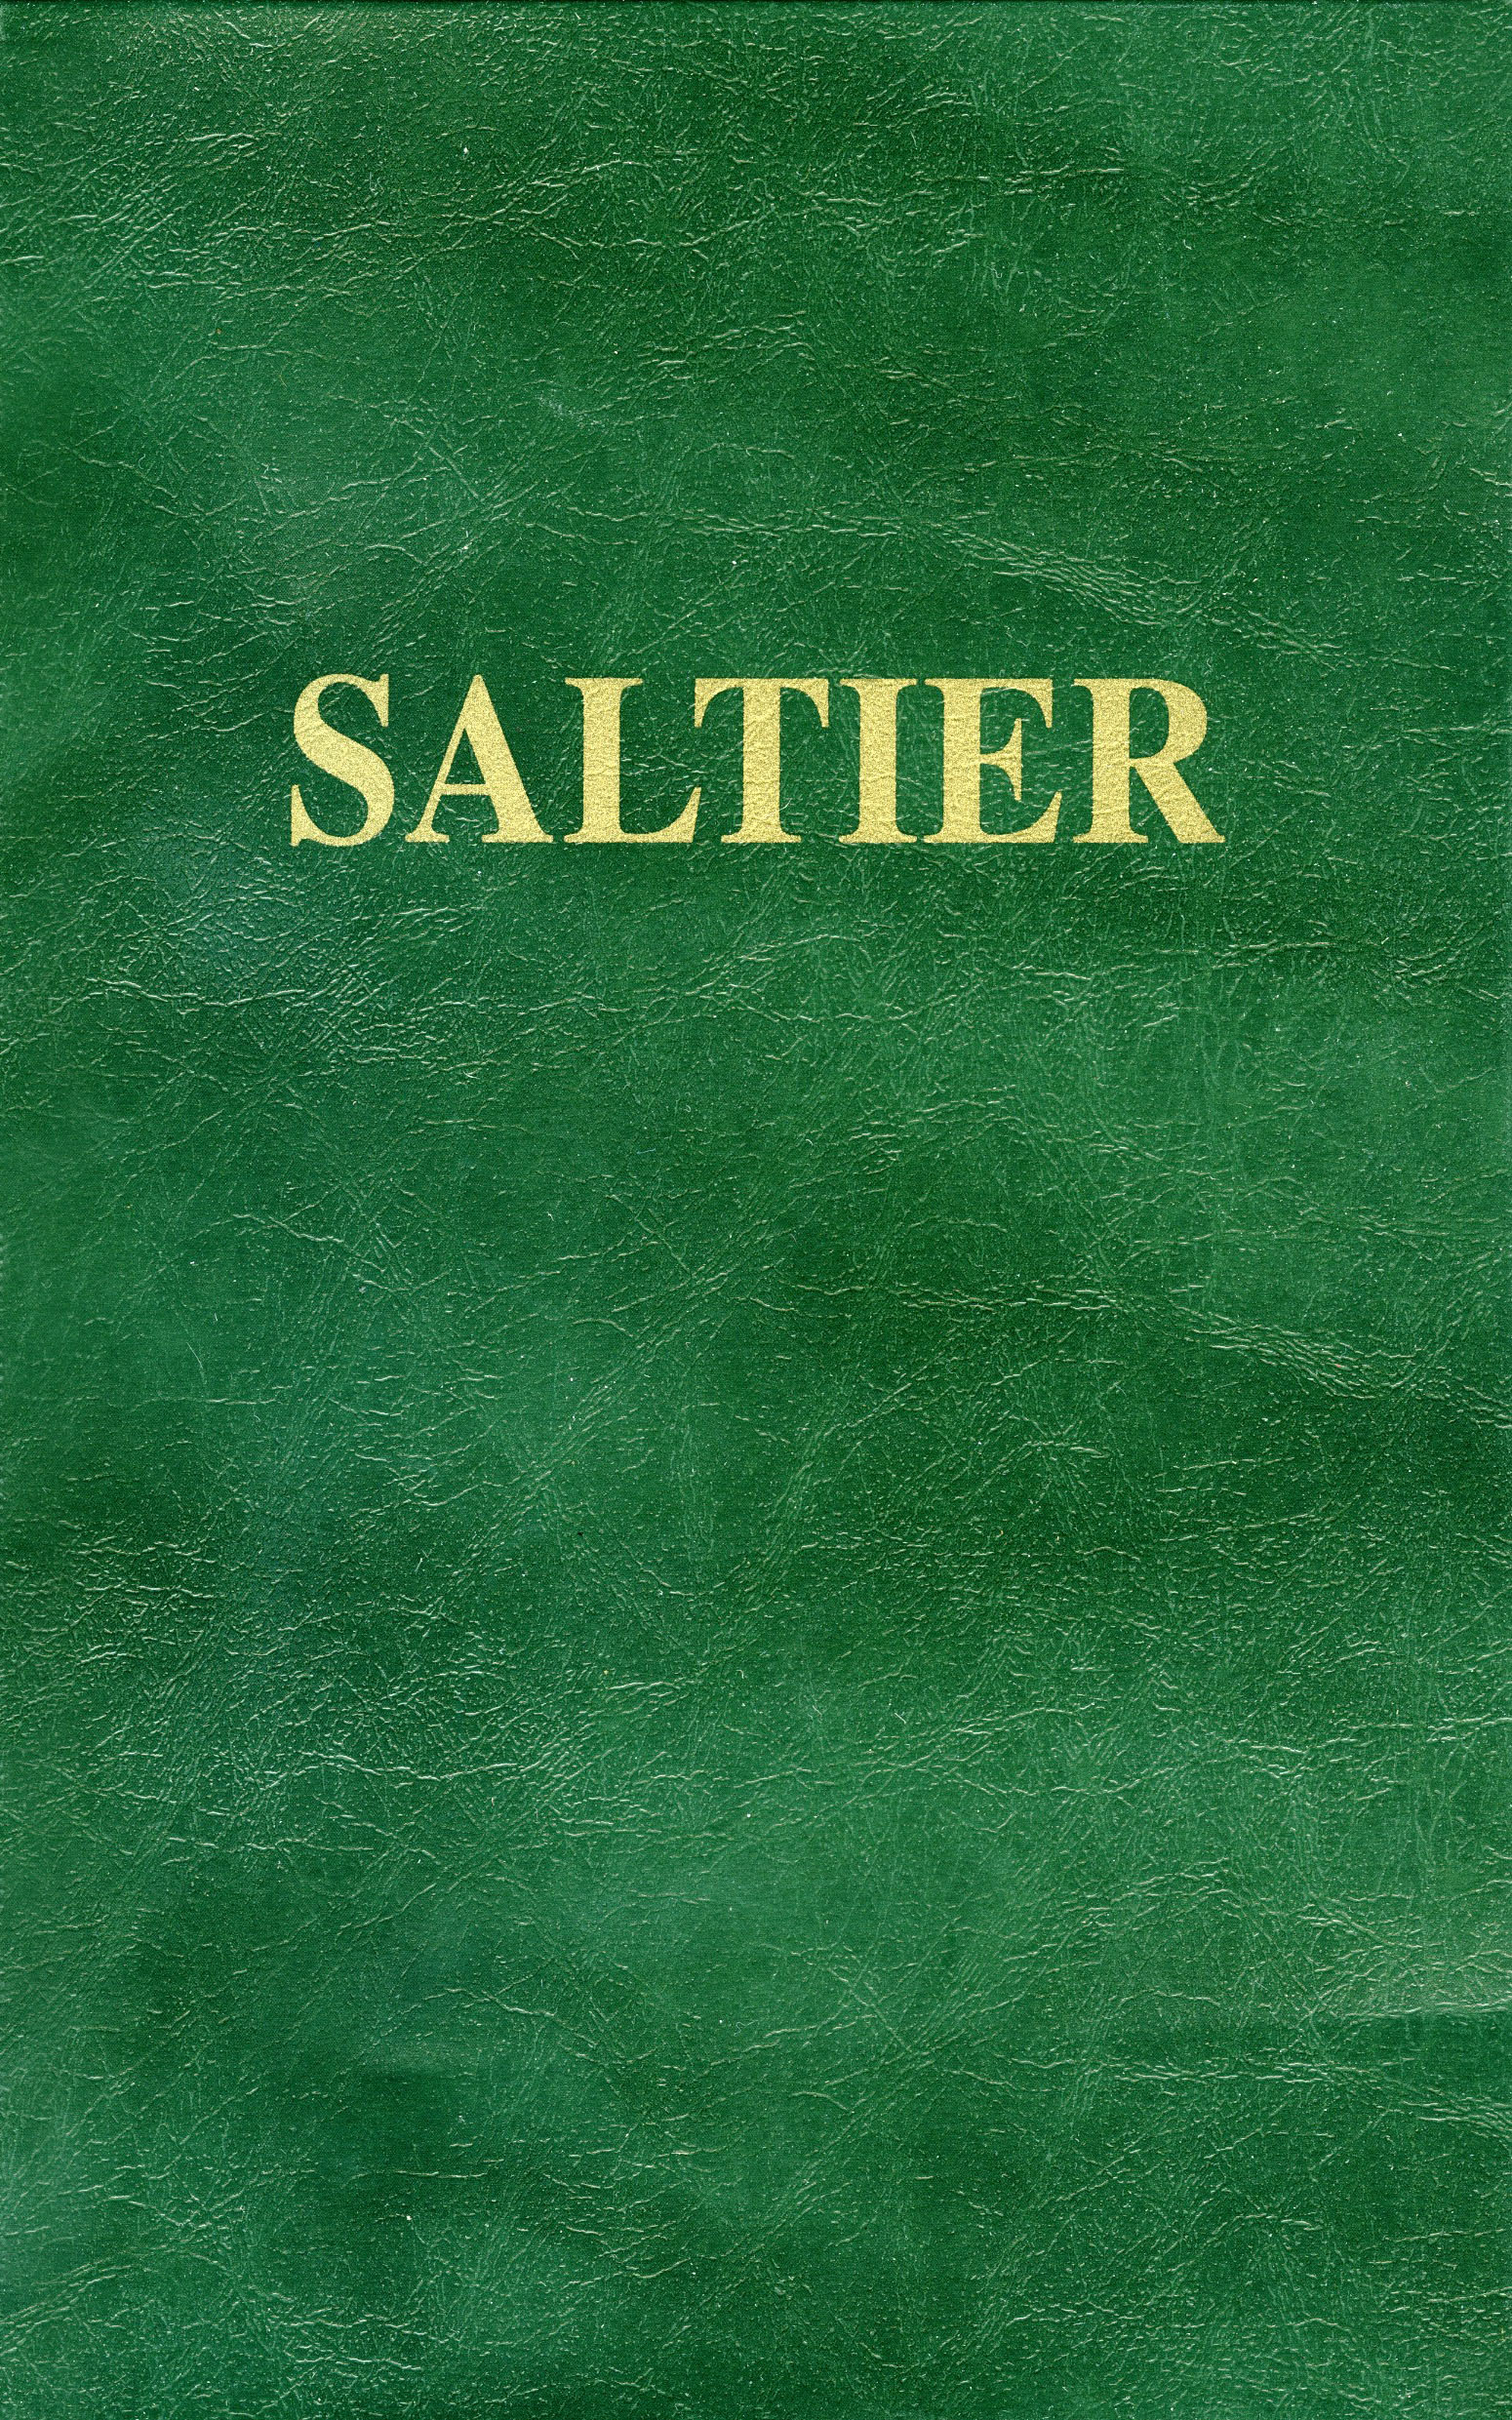 Saltier.jpg